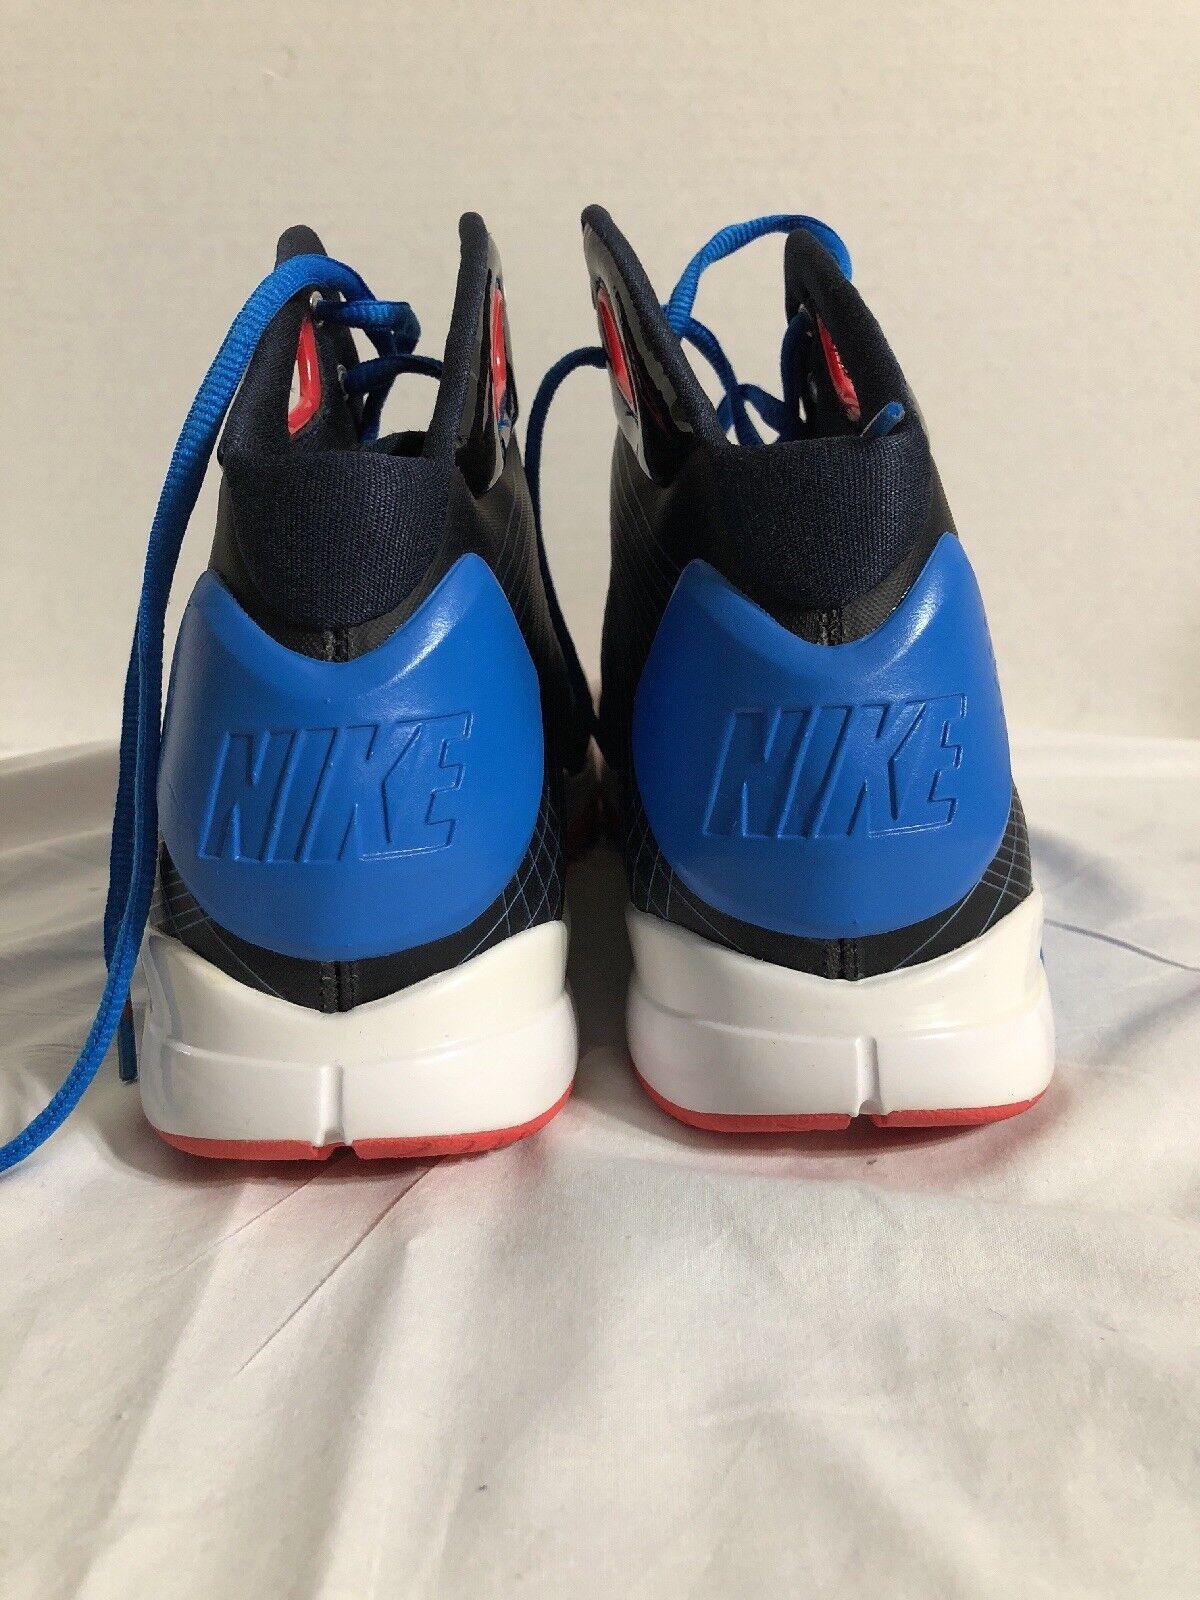 innovative design e2119 d4bb5 ... NIKE HYPERDUNK HYPERDUNK HYPERDUNK SUPREME ROYAL BLUE WHITE RED and  black 333373-411 12 size ...